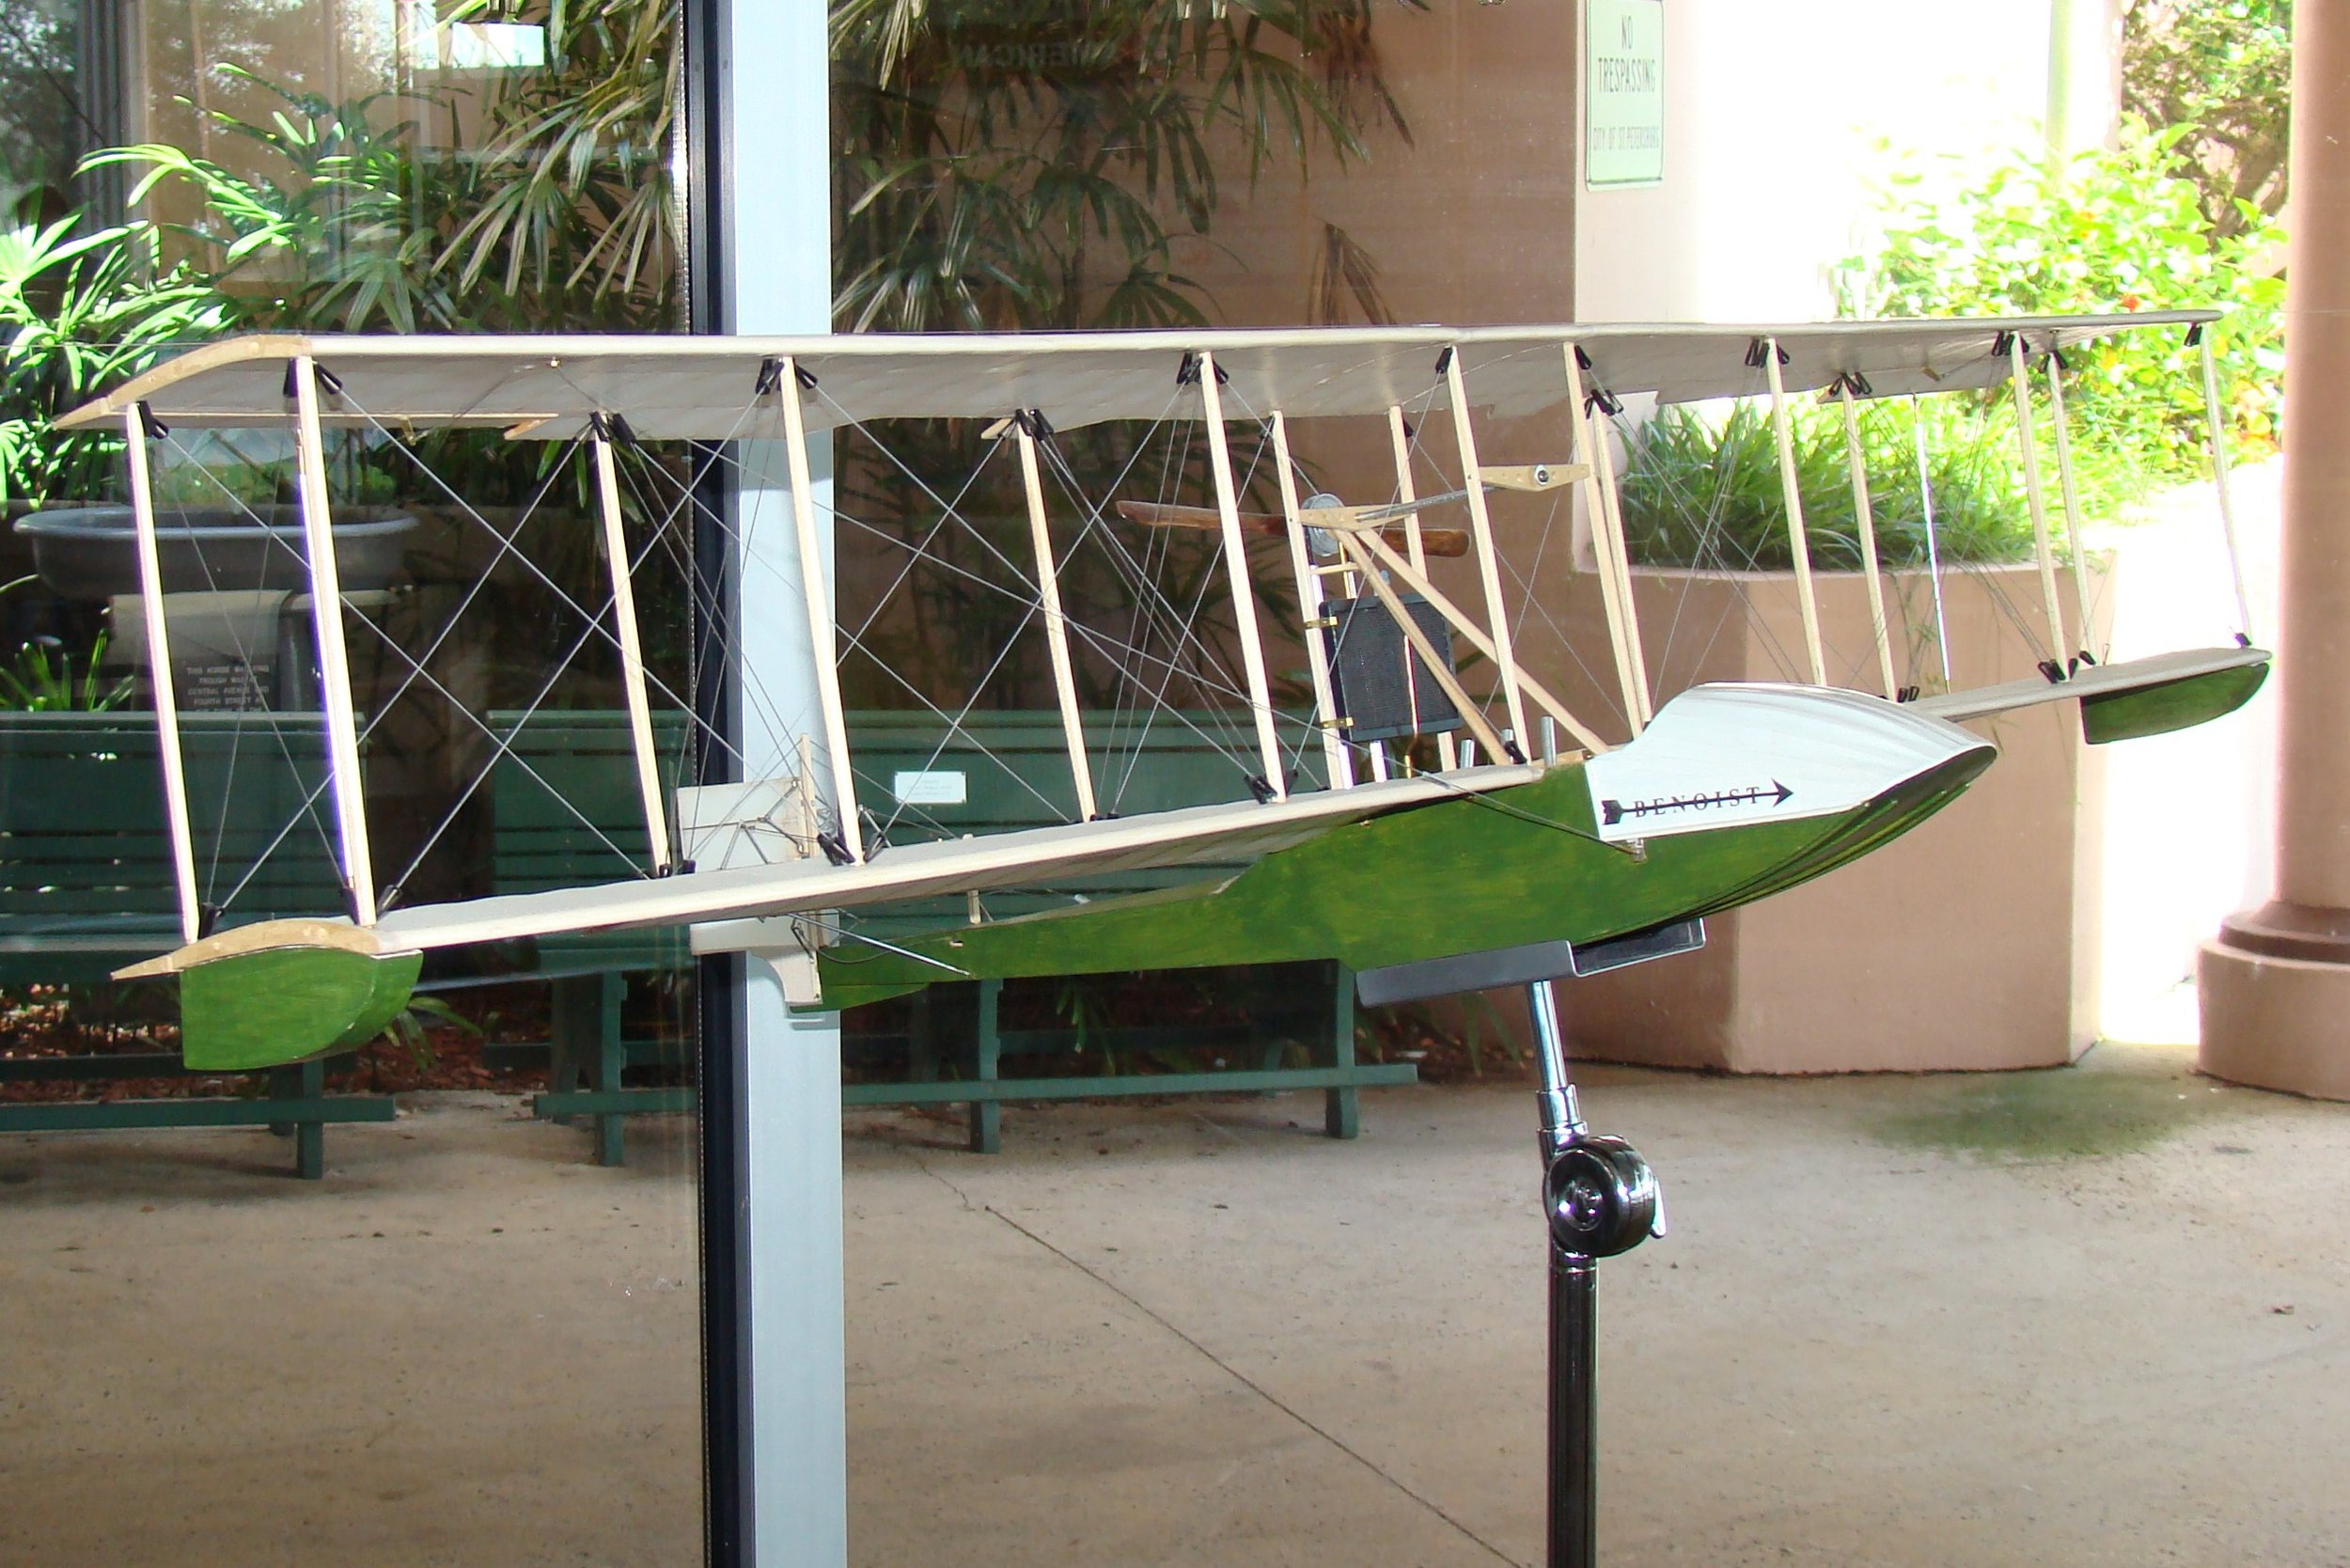 Model of Benoist Airboat, 14 Jun '12.JPG